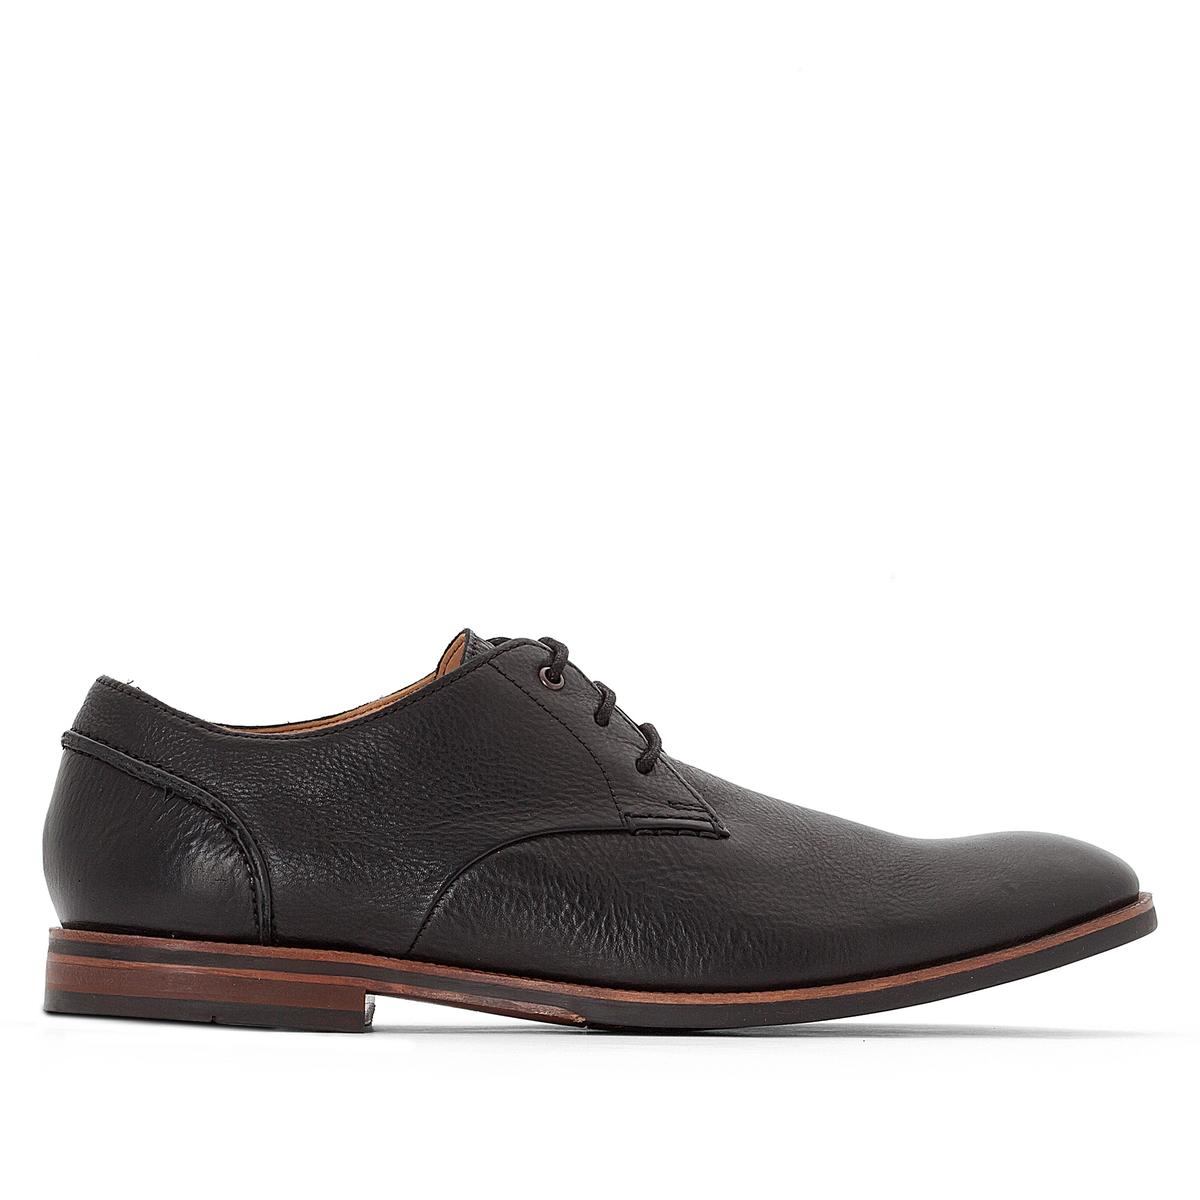 CLARKS Ботинки-оксфорды кожаные Broyd Walk